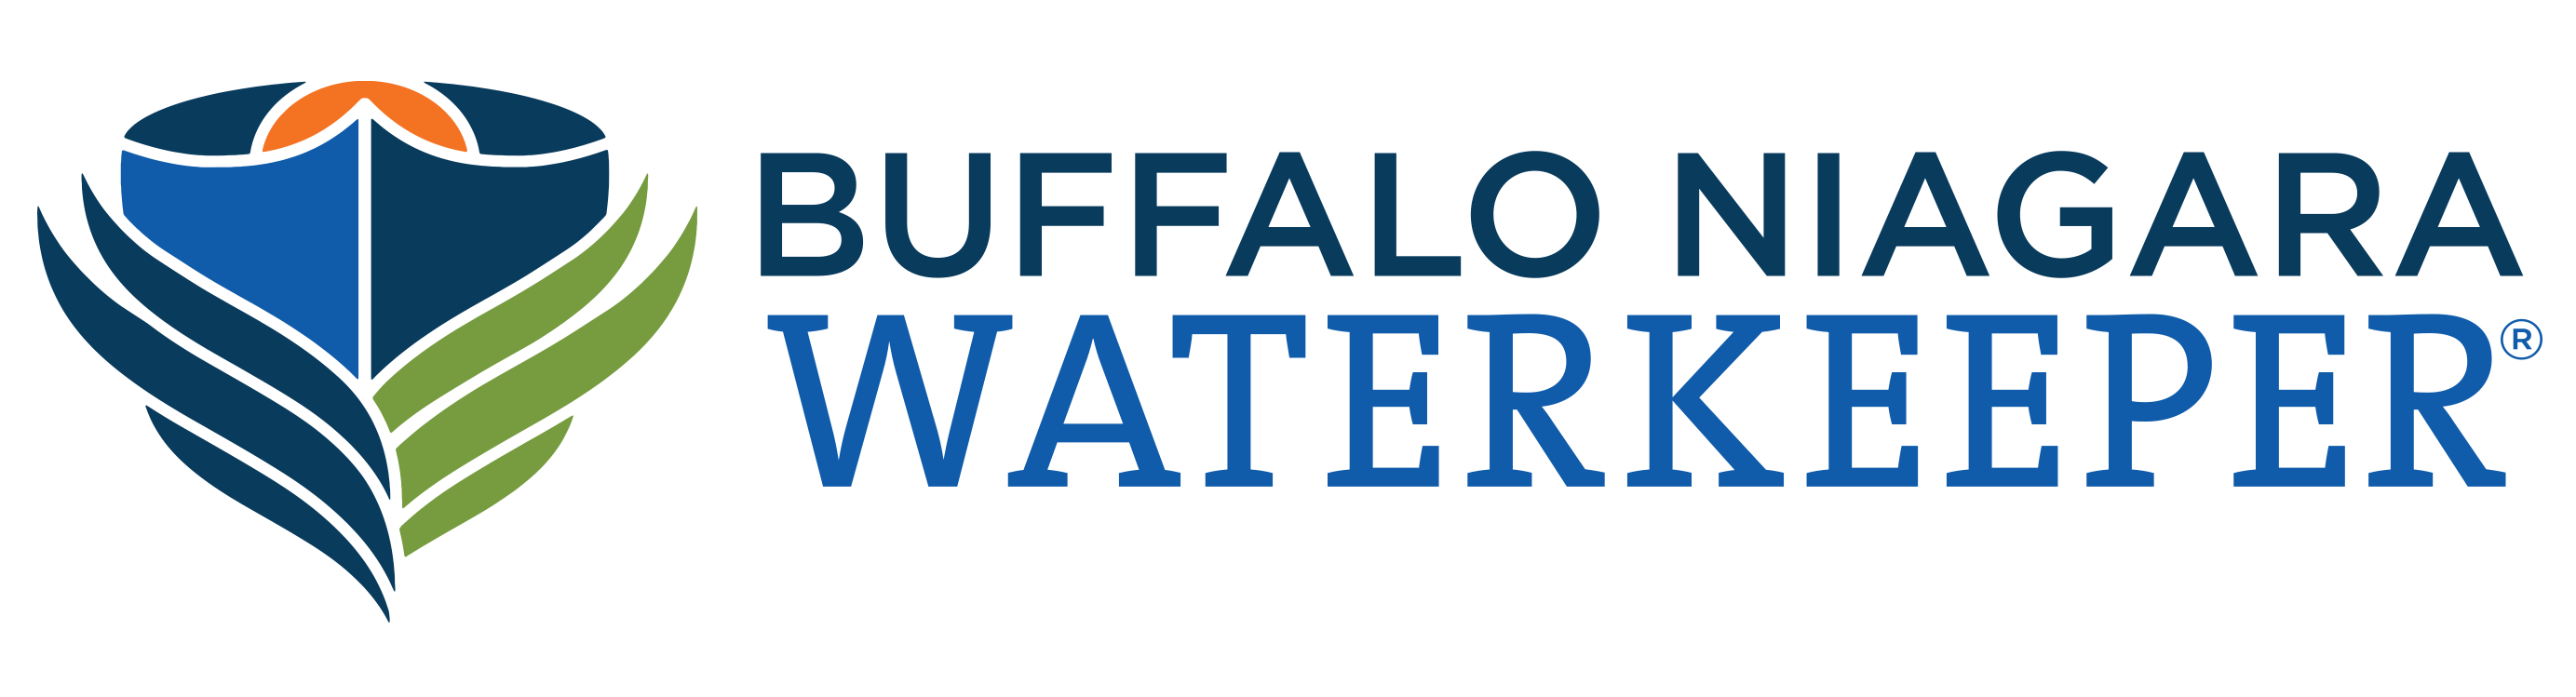 BUFFALO NIAGARA WATERKEEPER LOGO